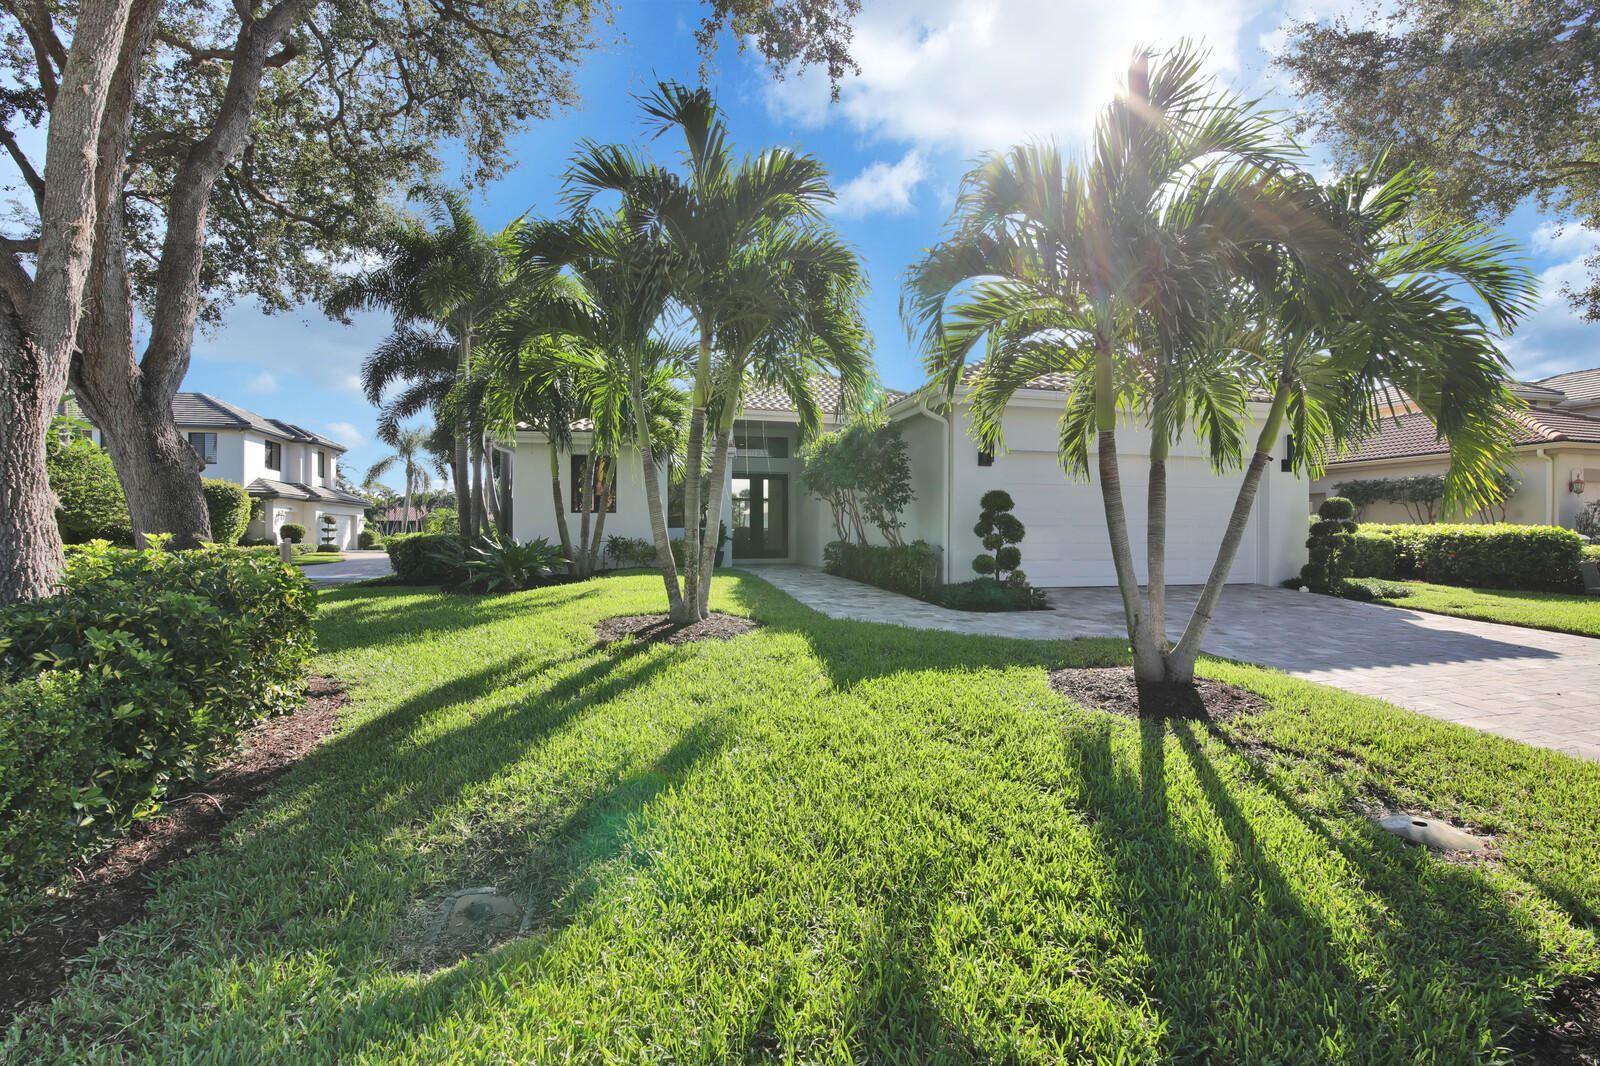 Photo of 13400 Provence Drive, Palm Beach Gardens, FL 33410 (MLS # RX-10663915)